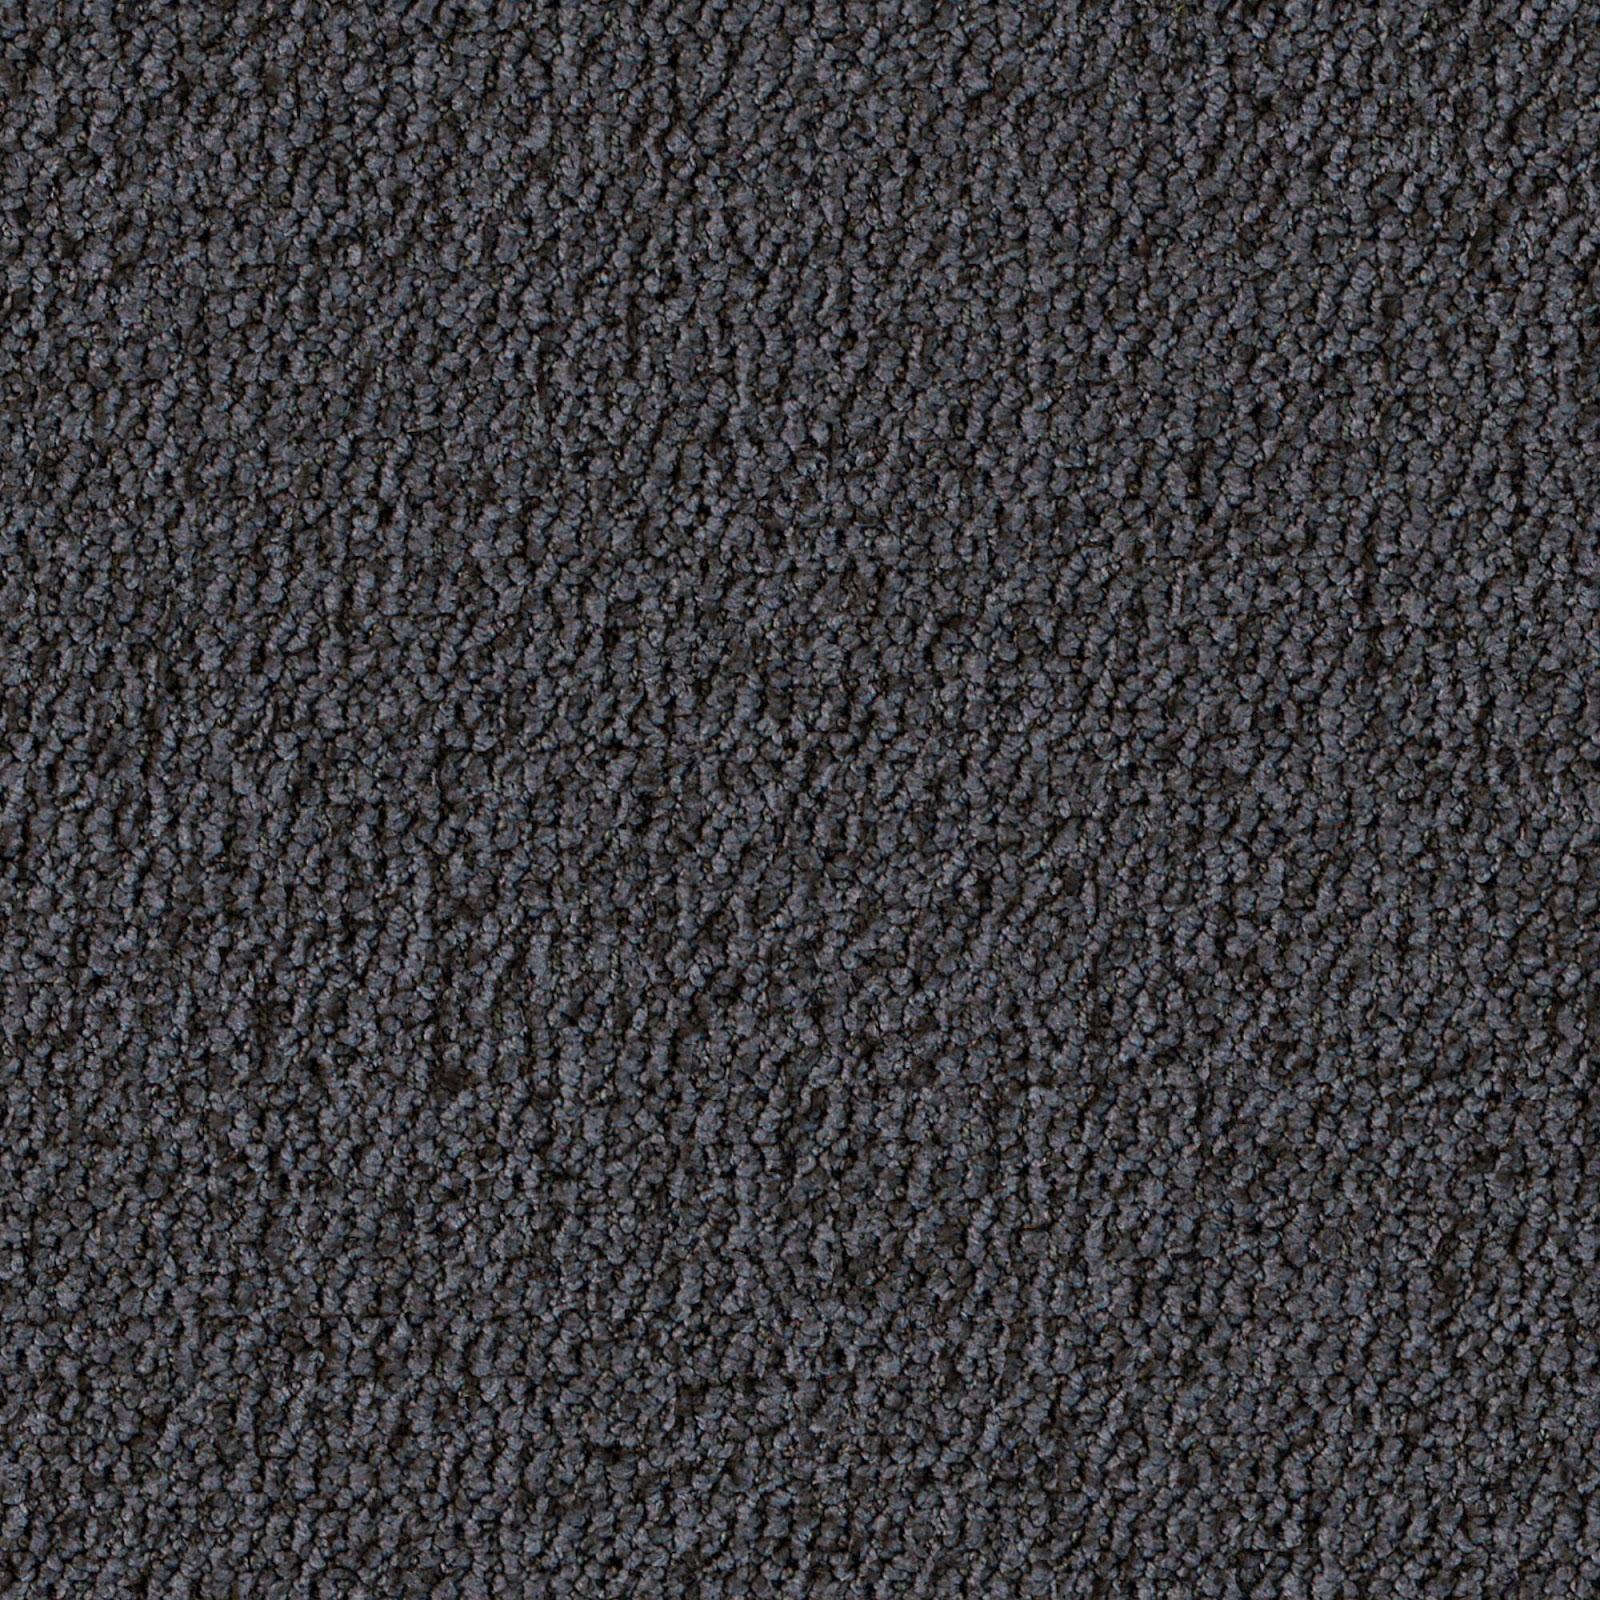 High Resolution Seamless Textures: Free Seamless Fabric Textures